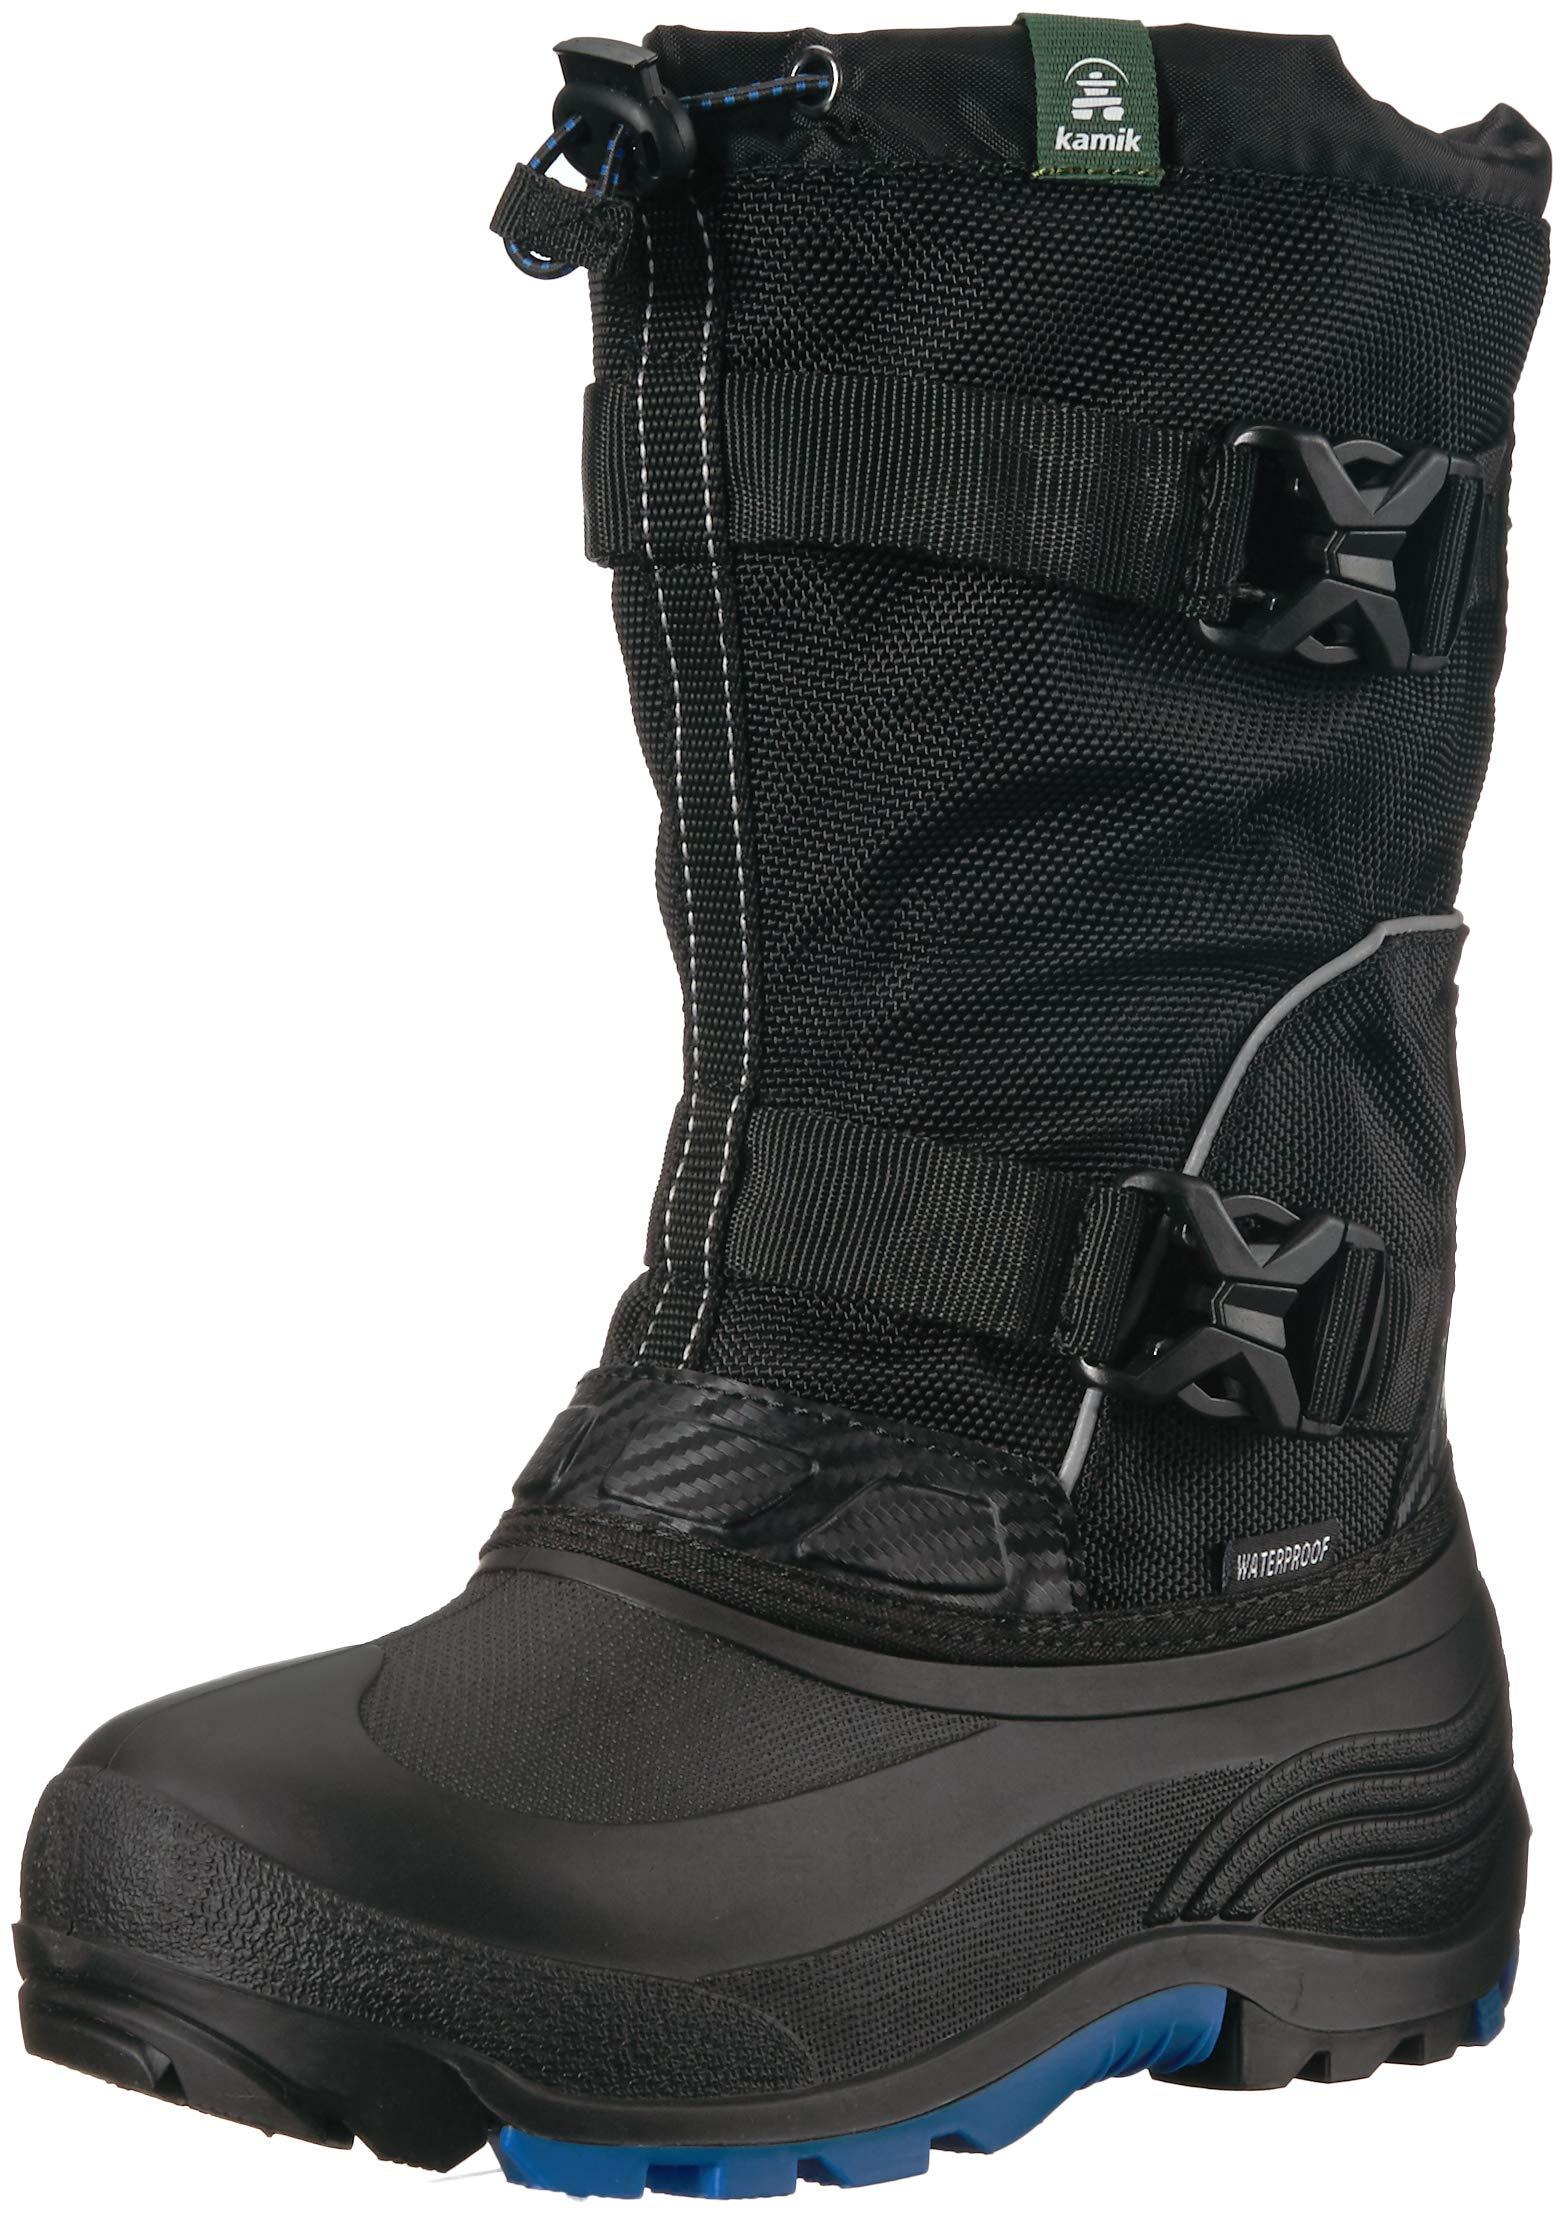 Kamik Boys' GLACIAL2 Snow Boot, Black/Blue, 2 Medium US Big Kid